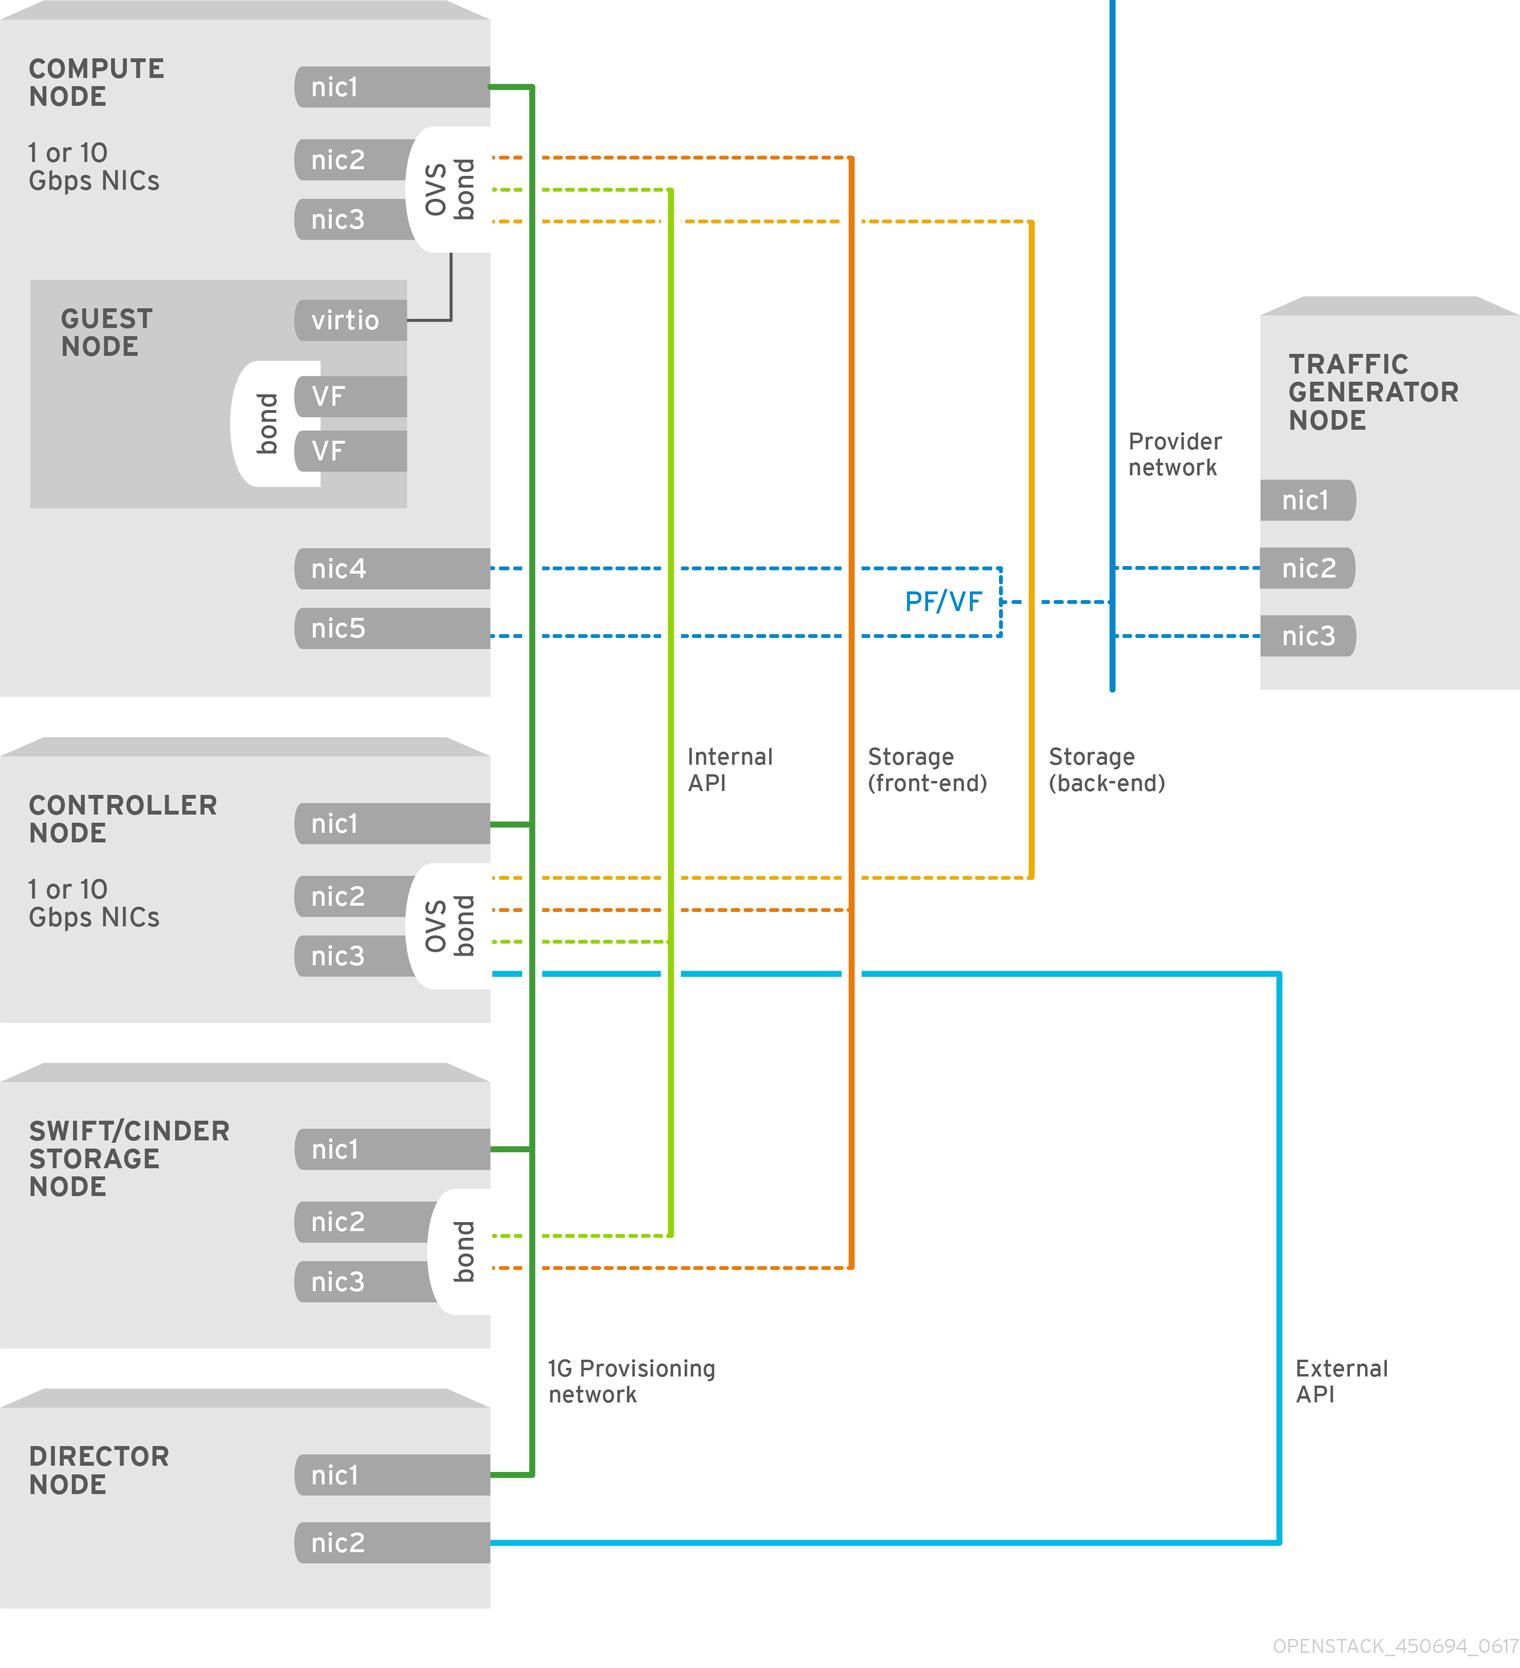 OpenStack NFV Config Guide Topology 450694 0617 ECE SR IOV